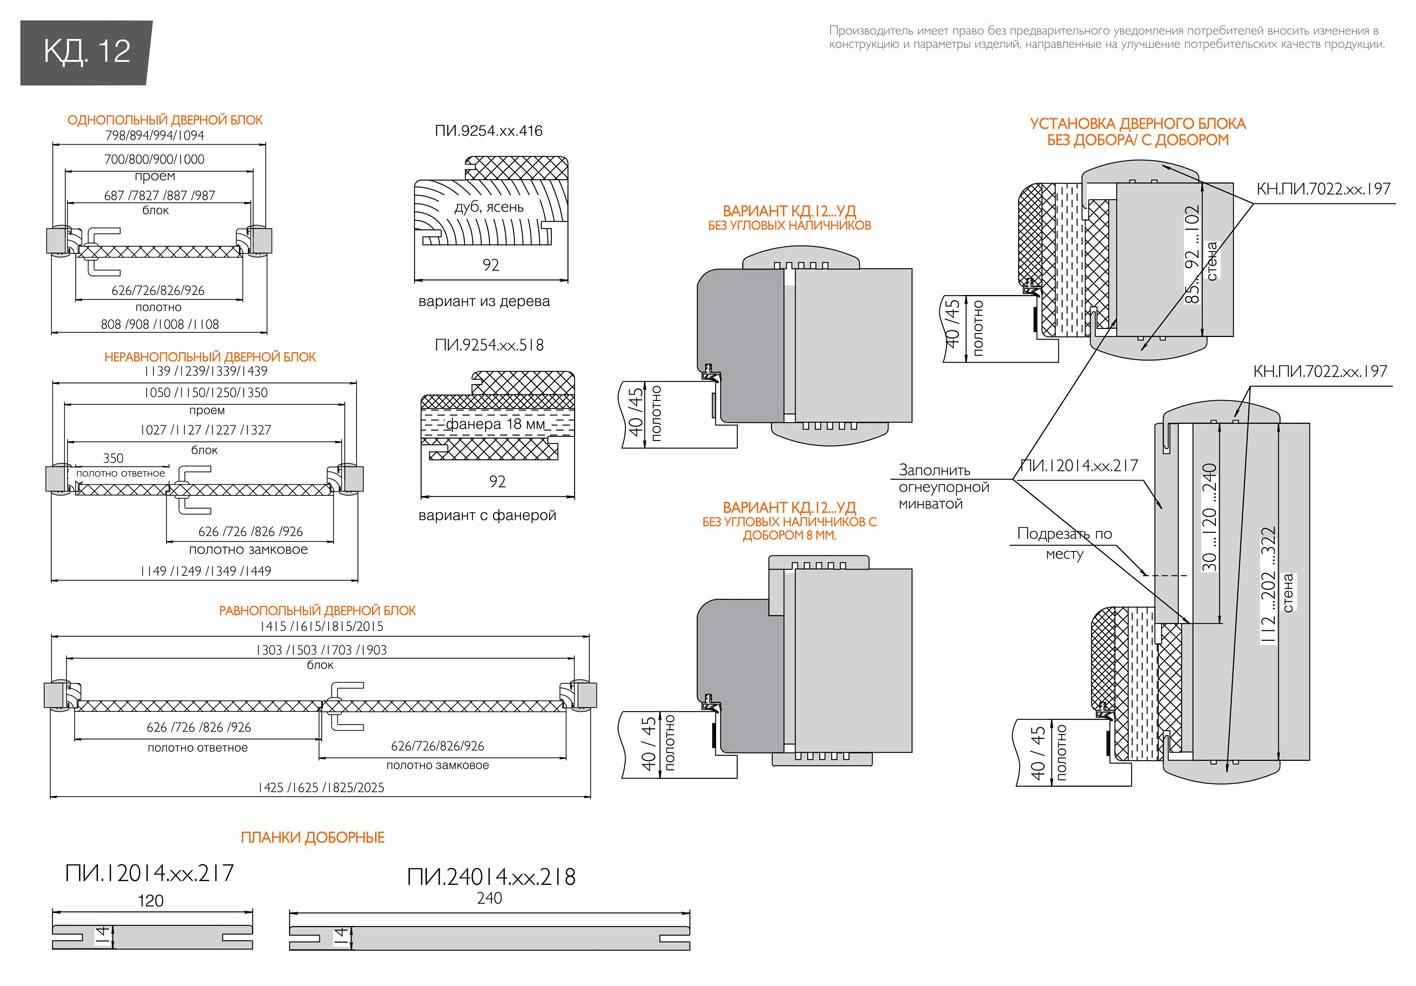 Коробка КД.09